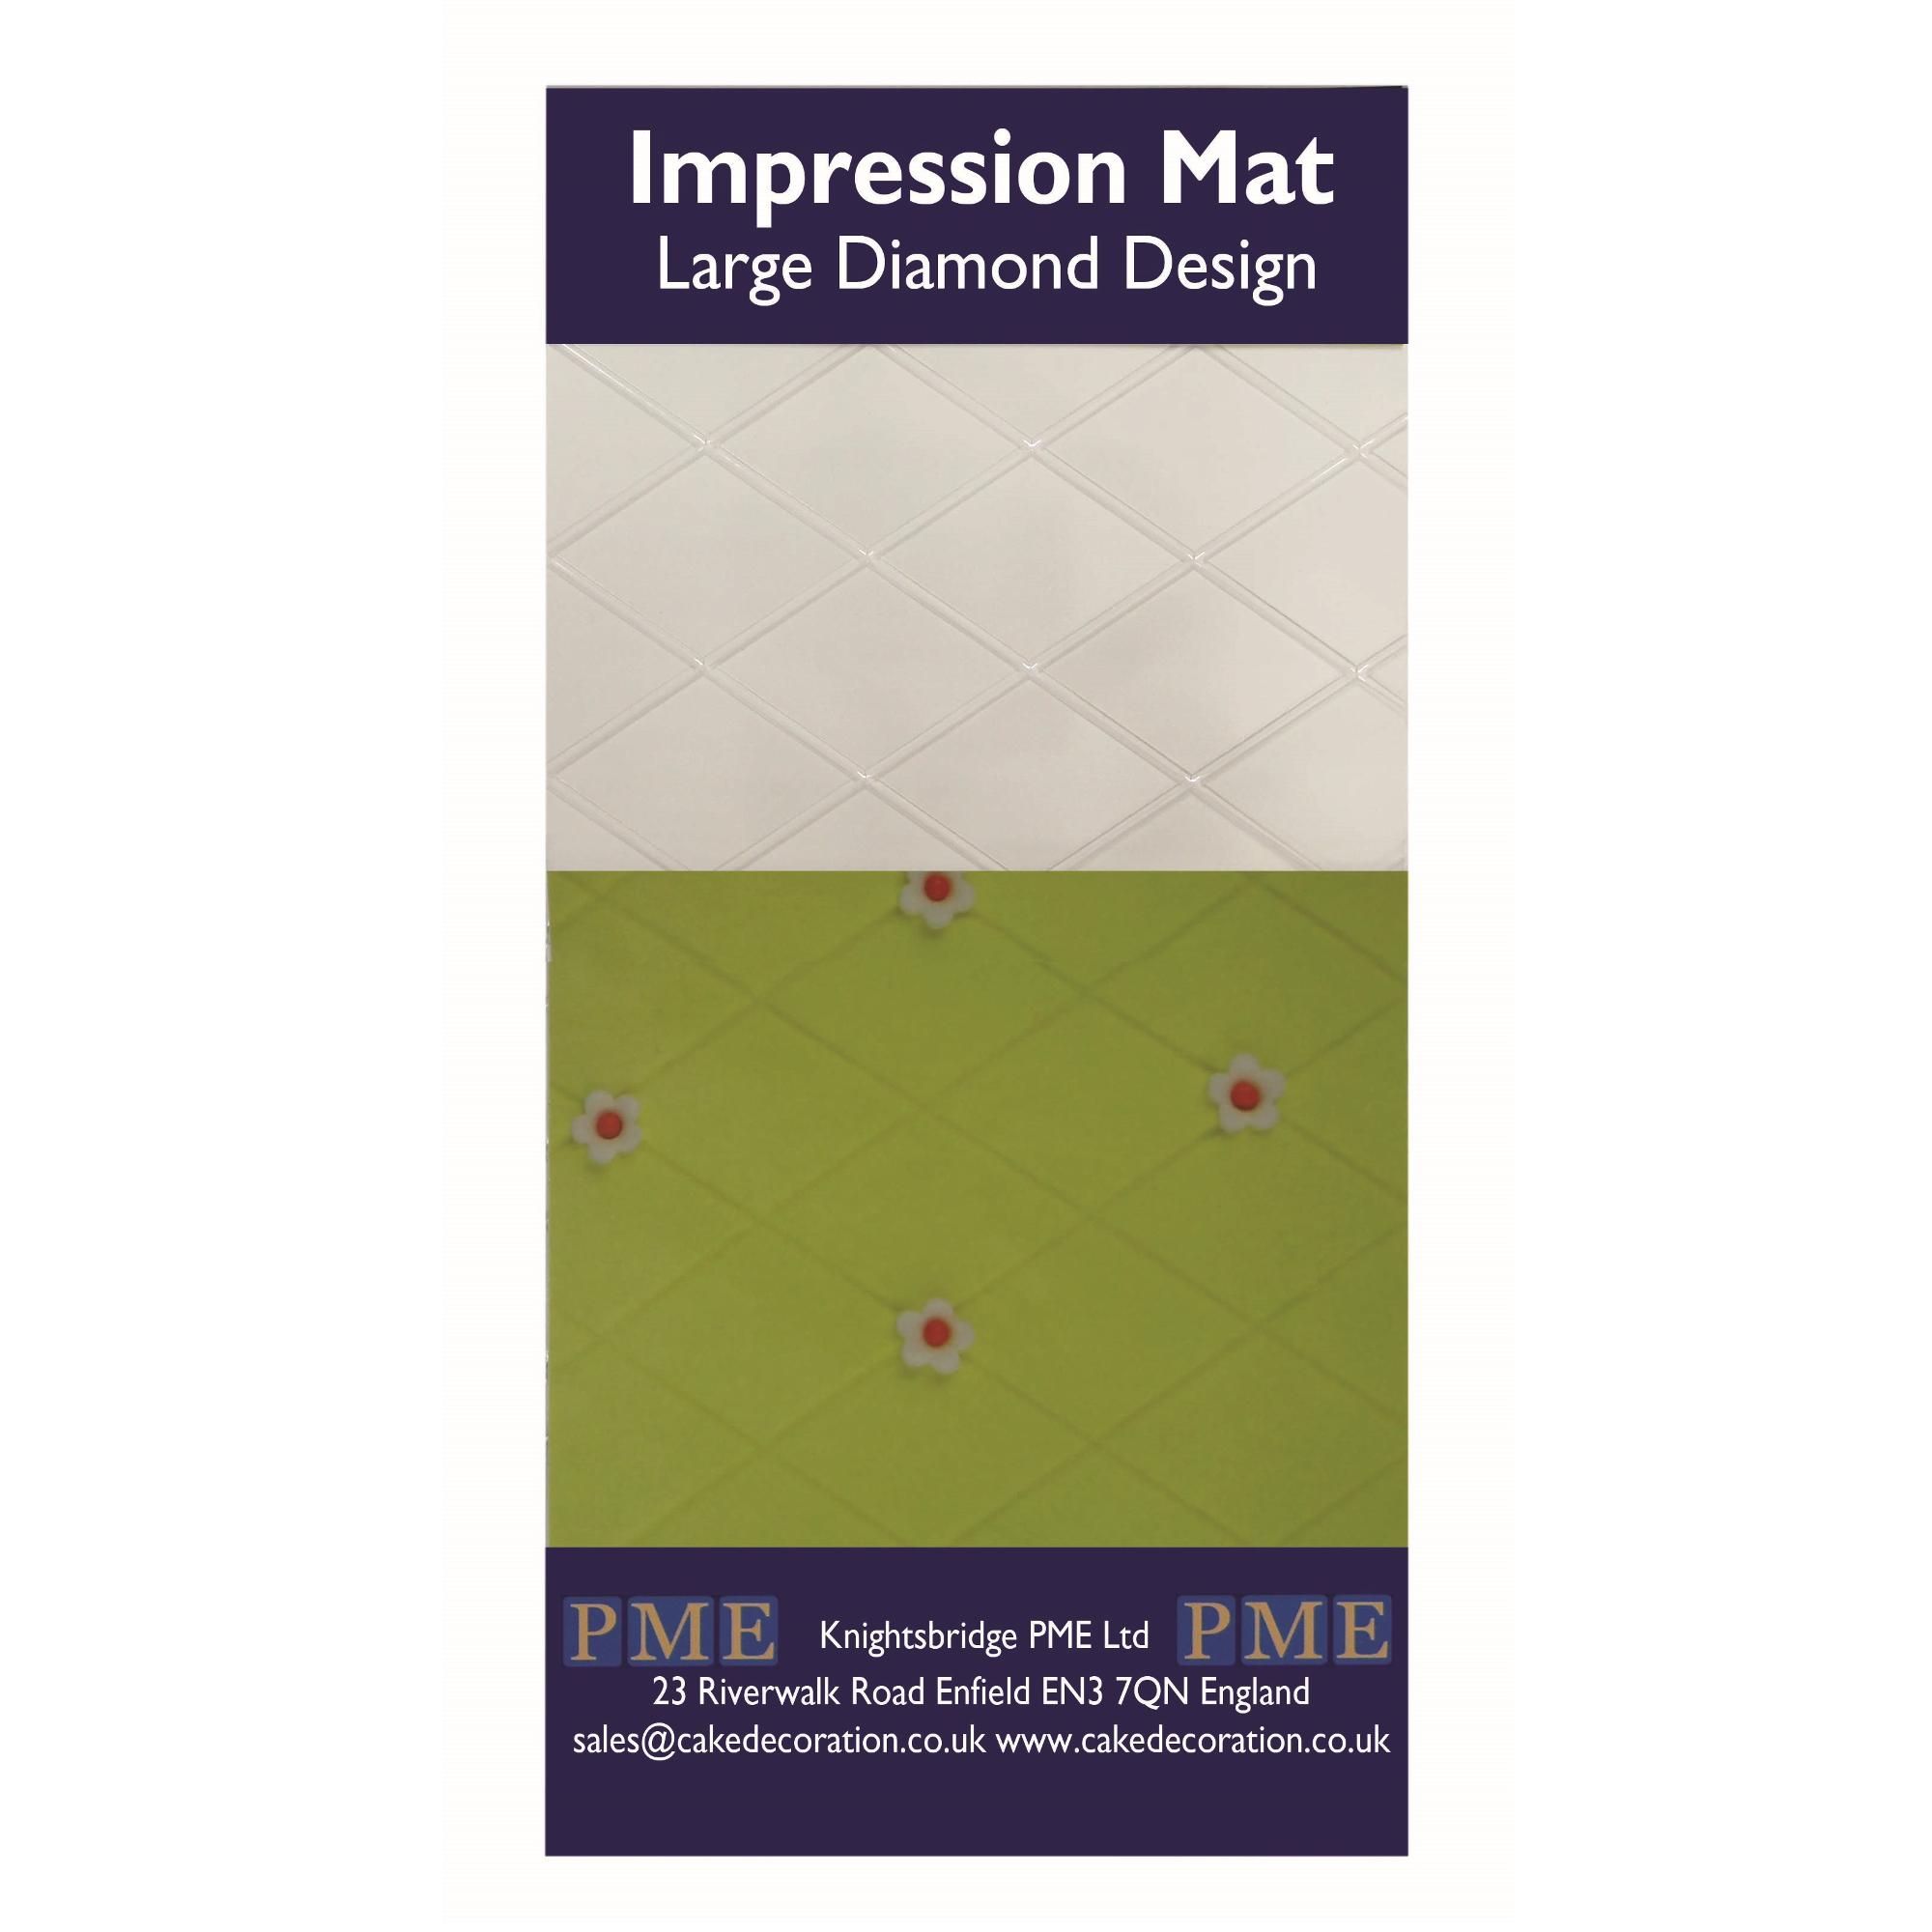 PME Icing Fondant Impression Imprint Mat Sugarcraft Candy Cake Decorating Mould